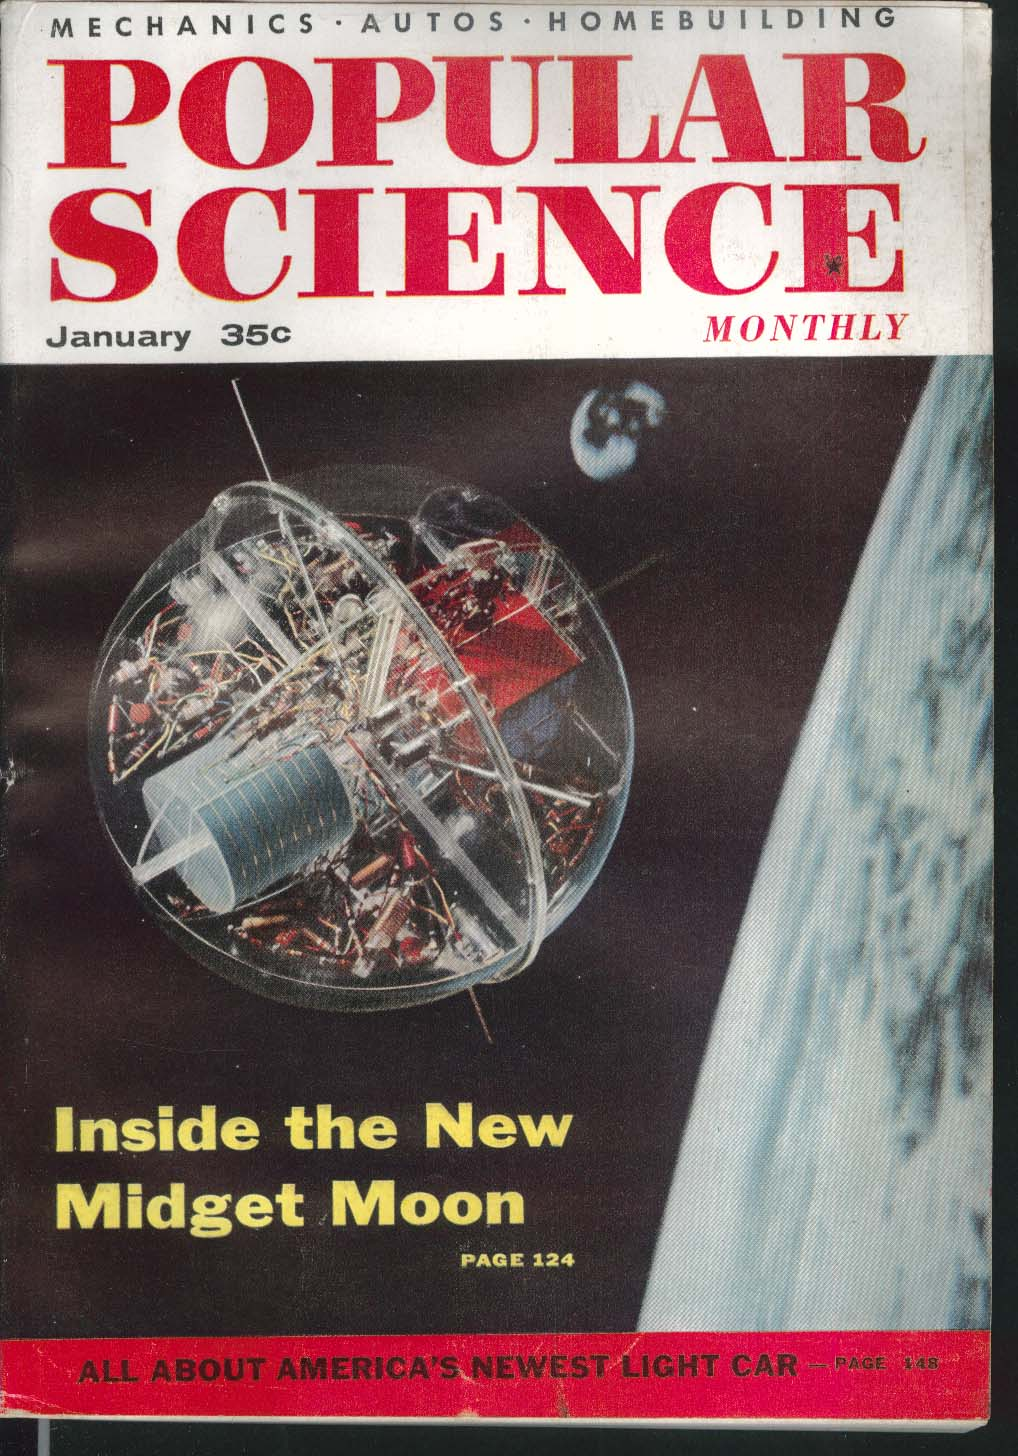 POPULAR SCIENCE Rambler Prefab Locomotives Air Force South Pole 1 1956